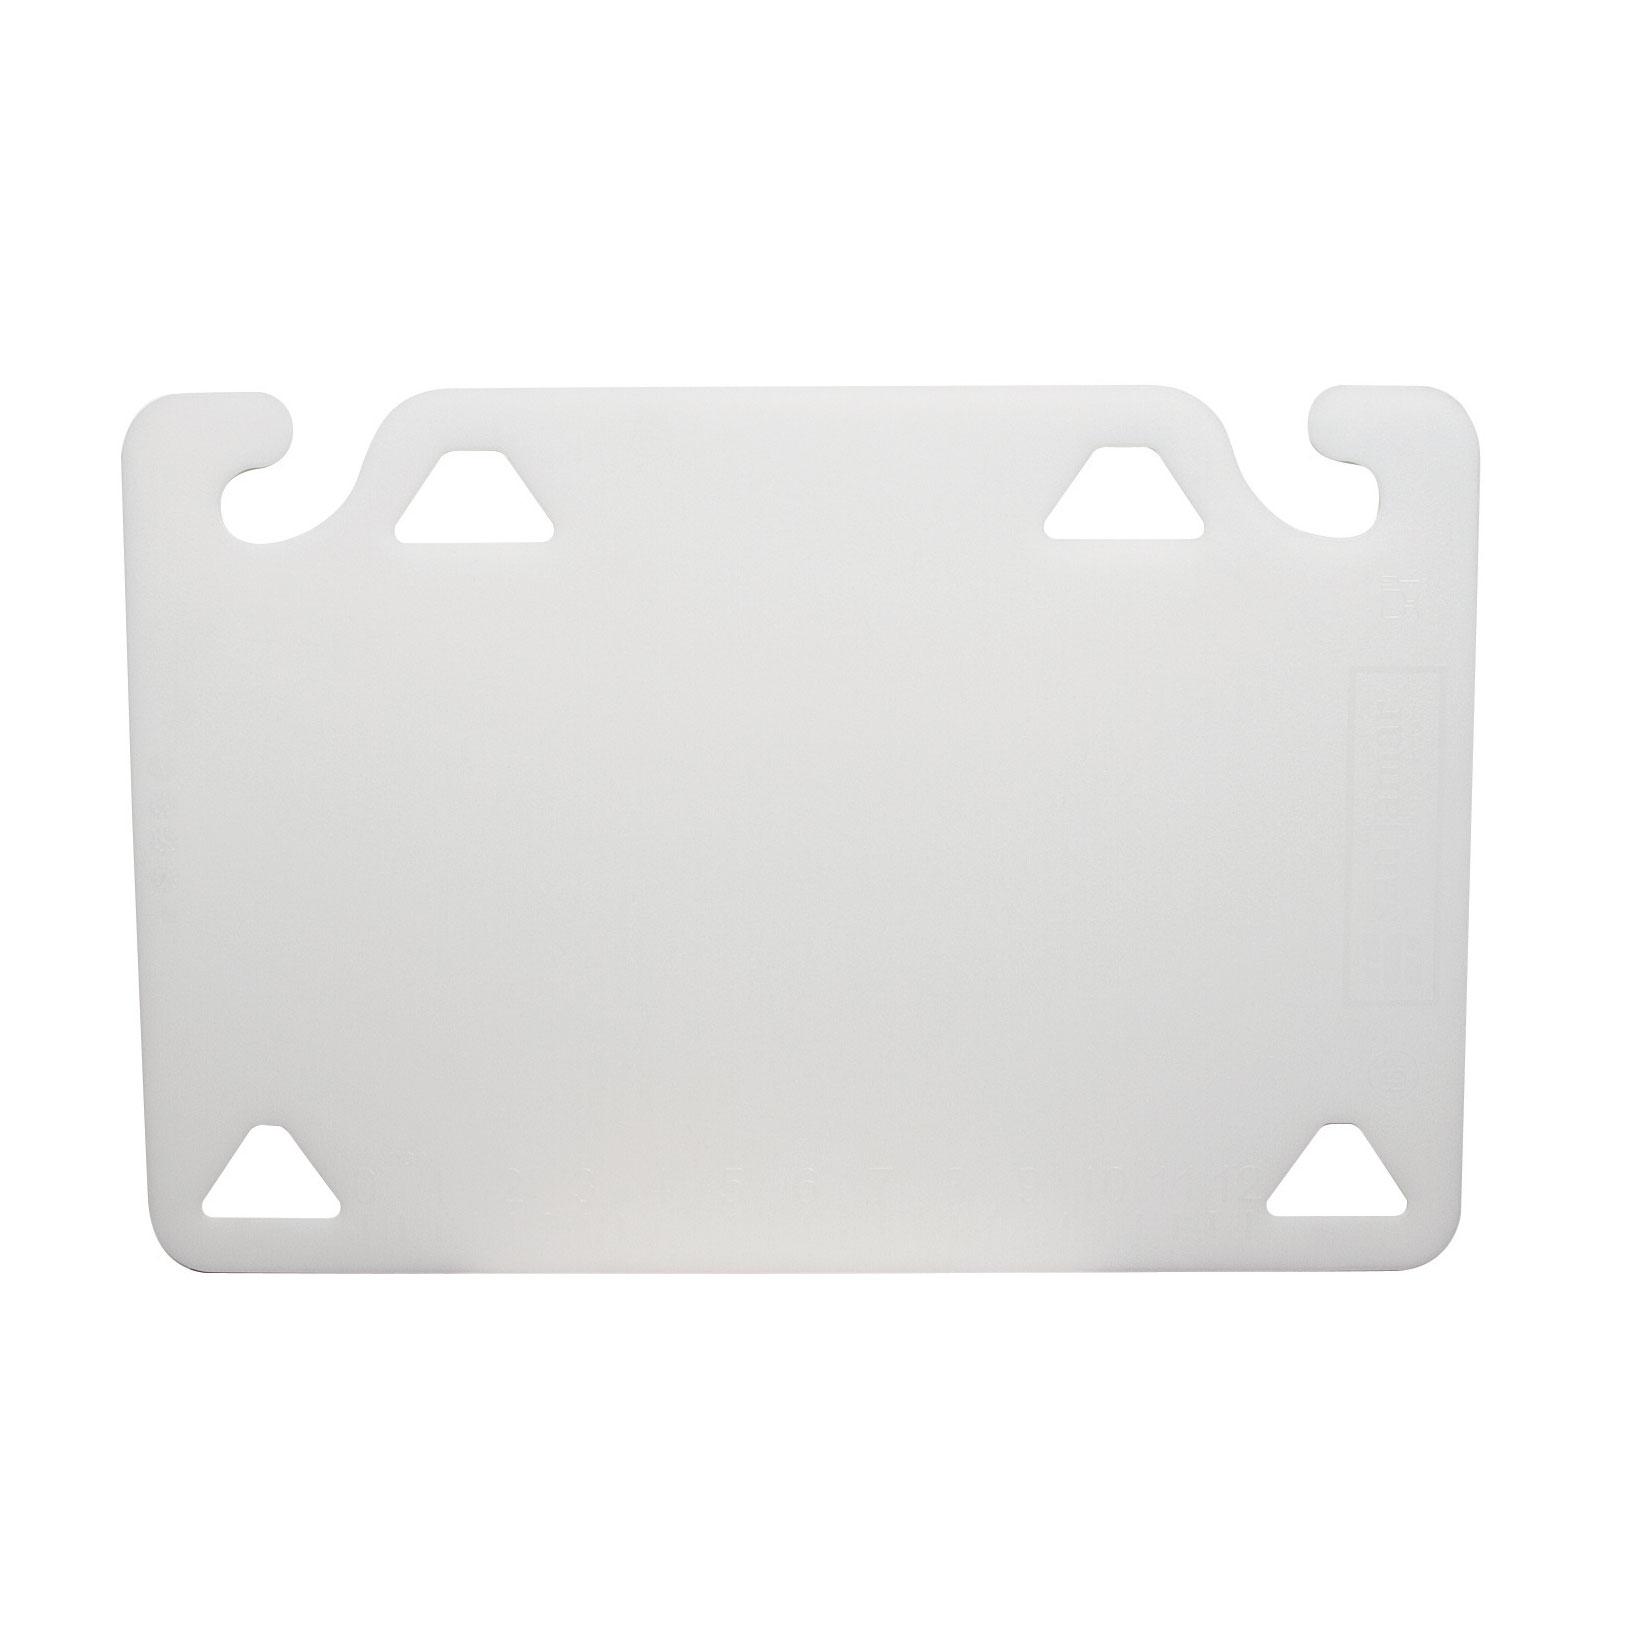 San Jamar CBQG1824WH cutting board, plastic